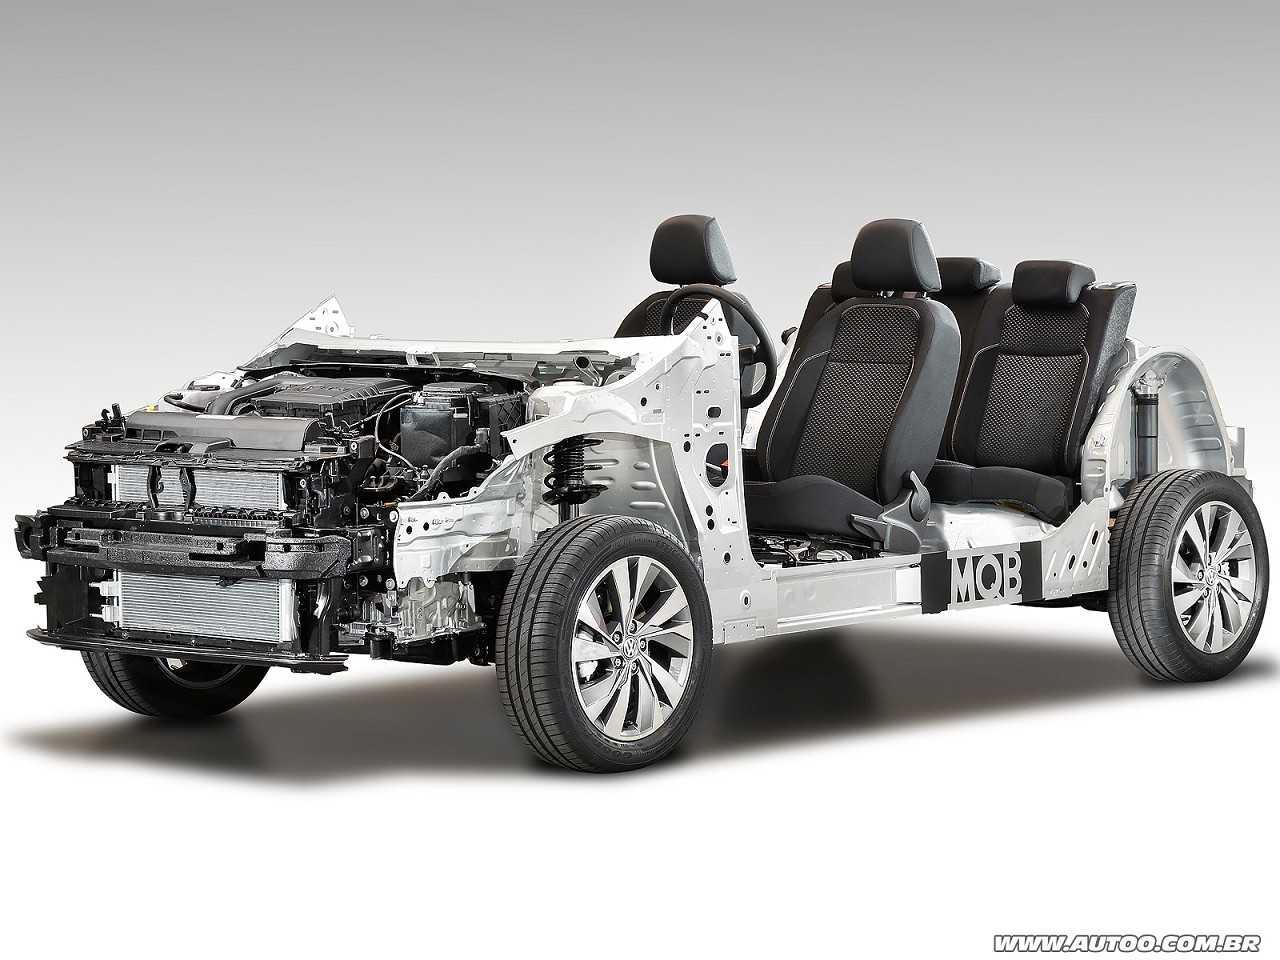 VolkswagenPolo 2018 - outros